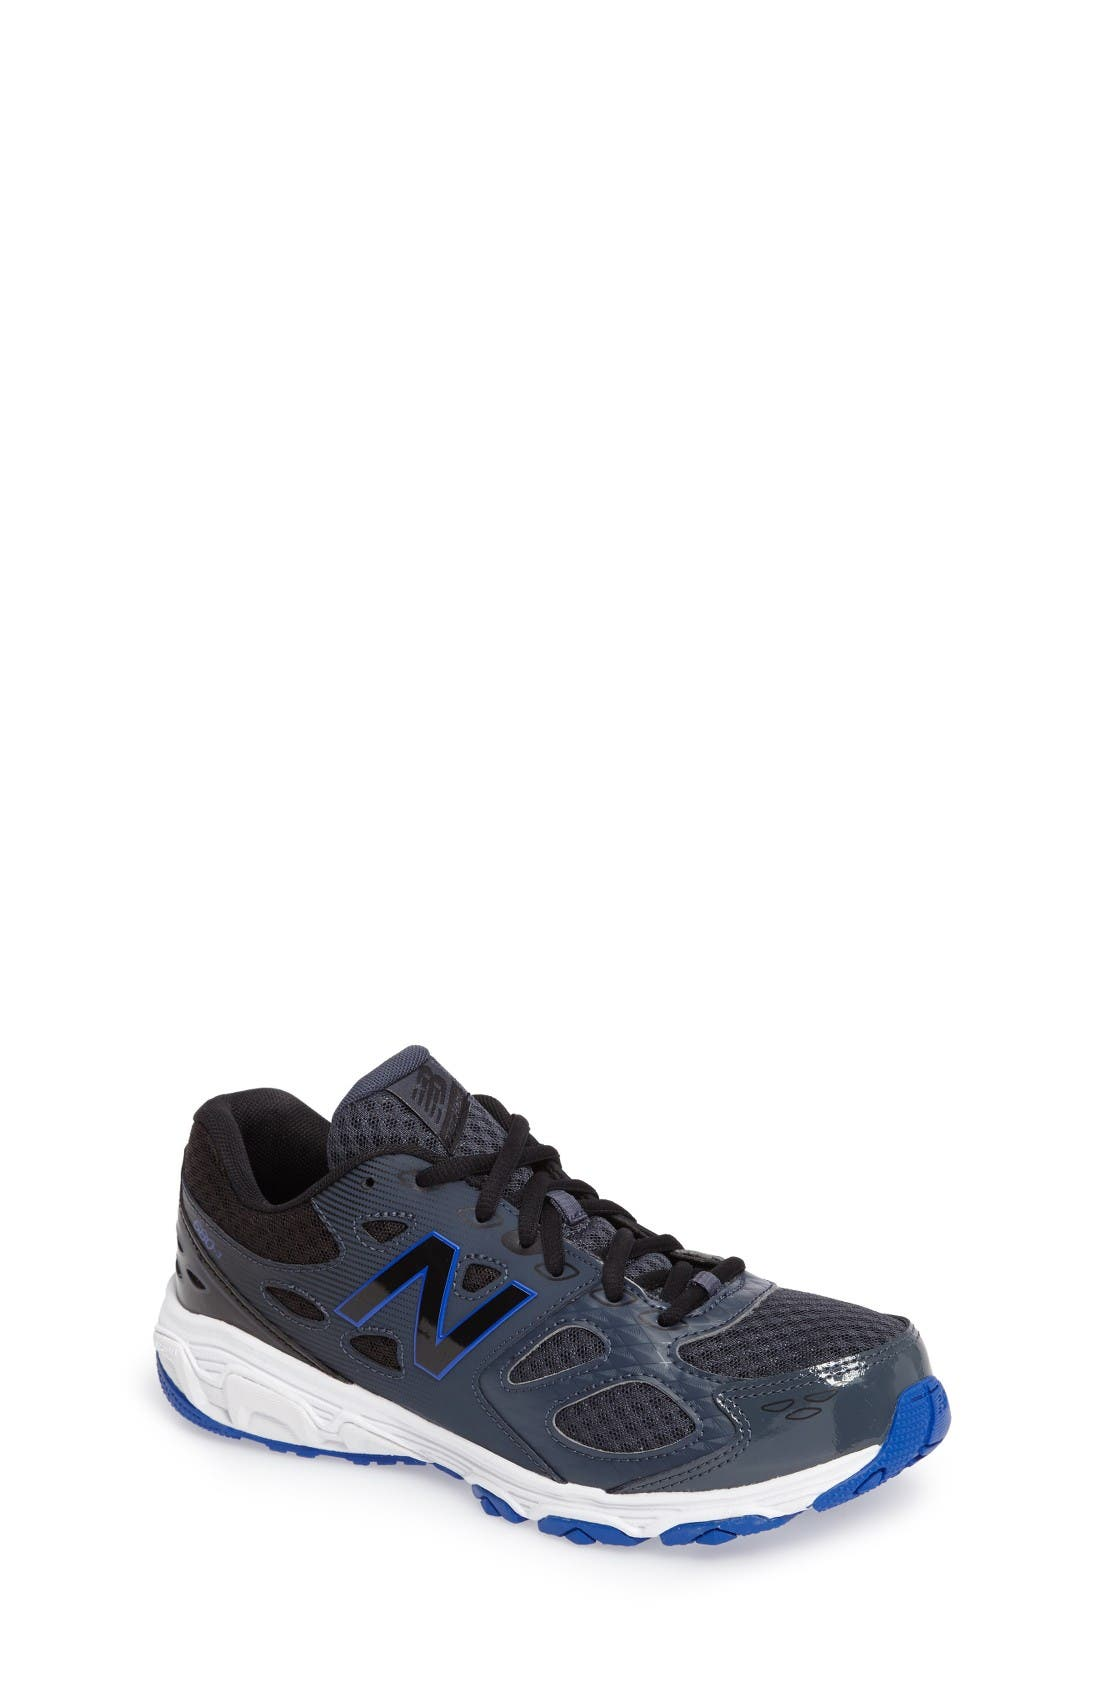 680v3 Sneaker,                         Main,                         color, Grey/Blue